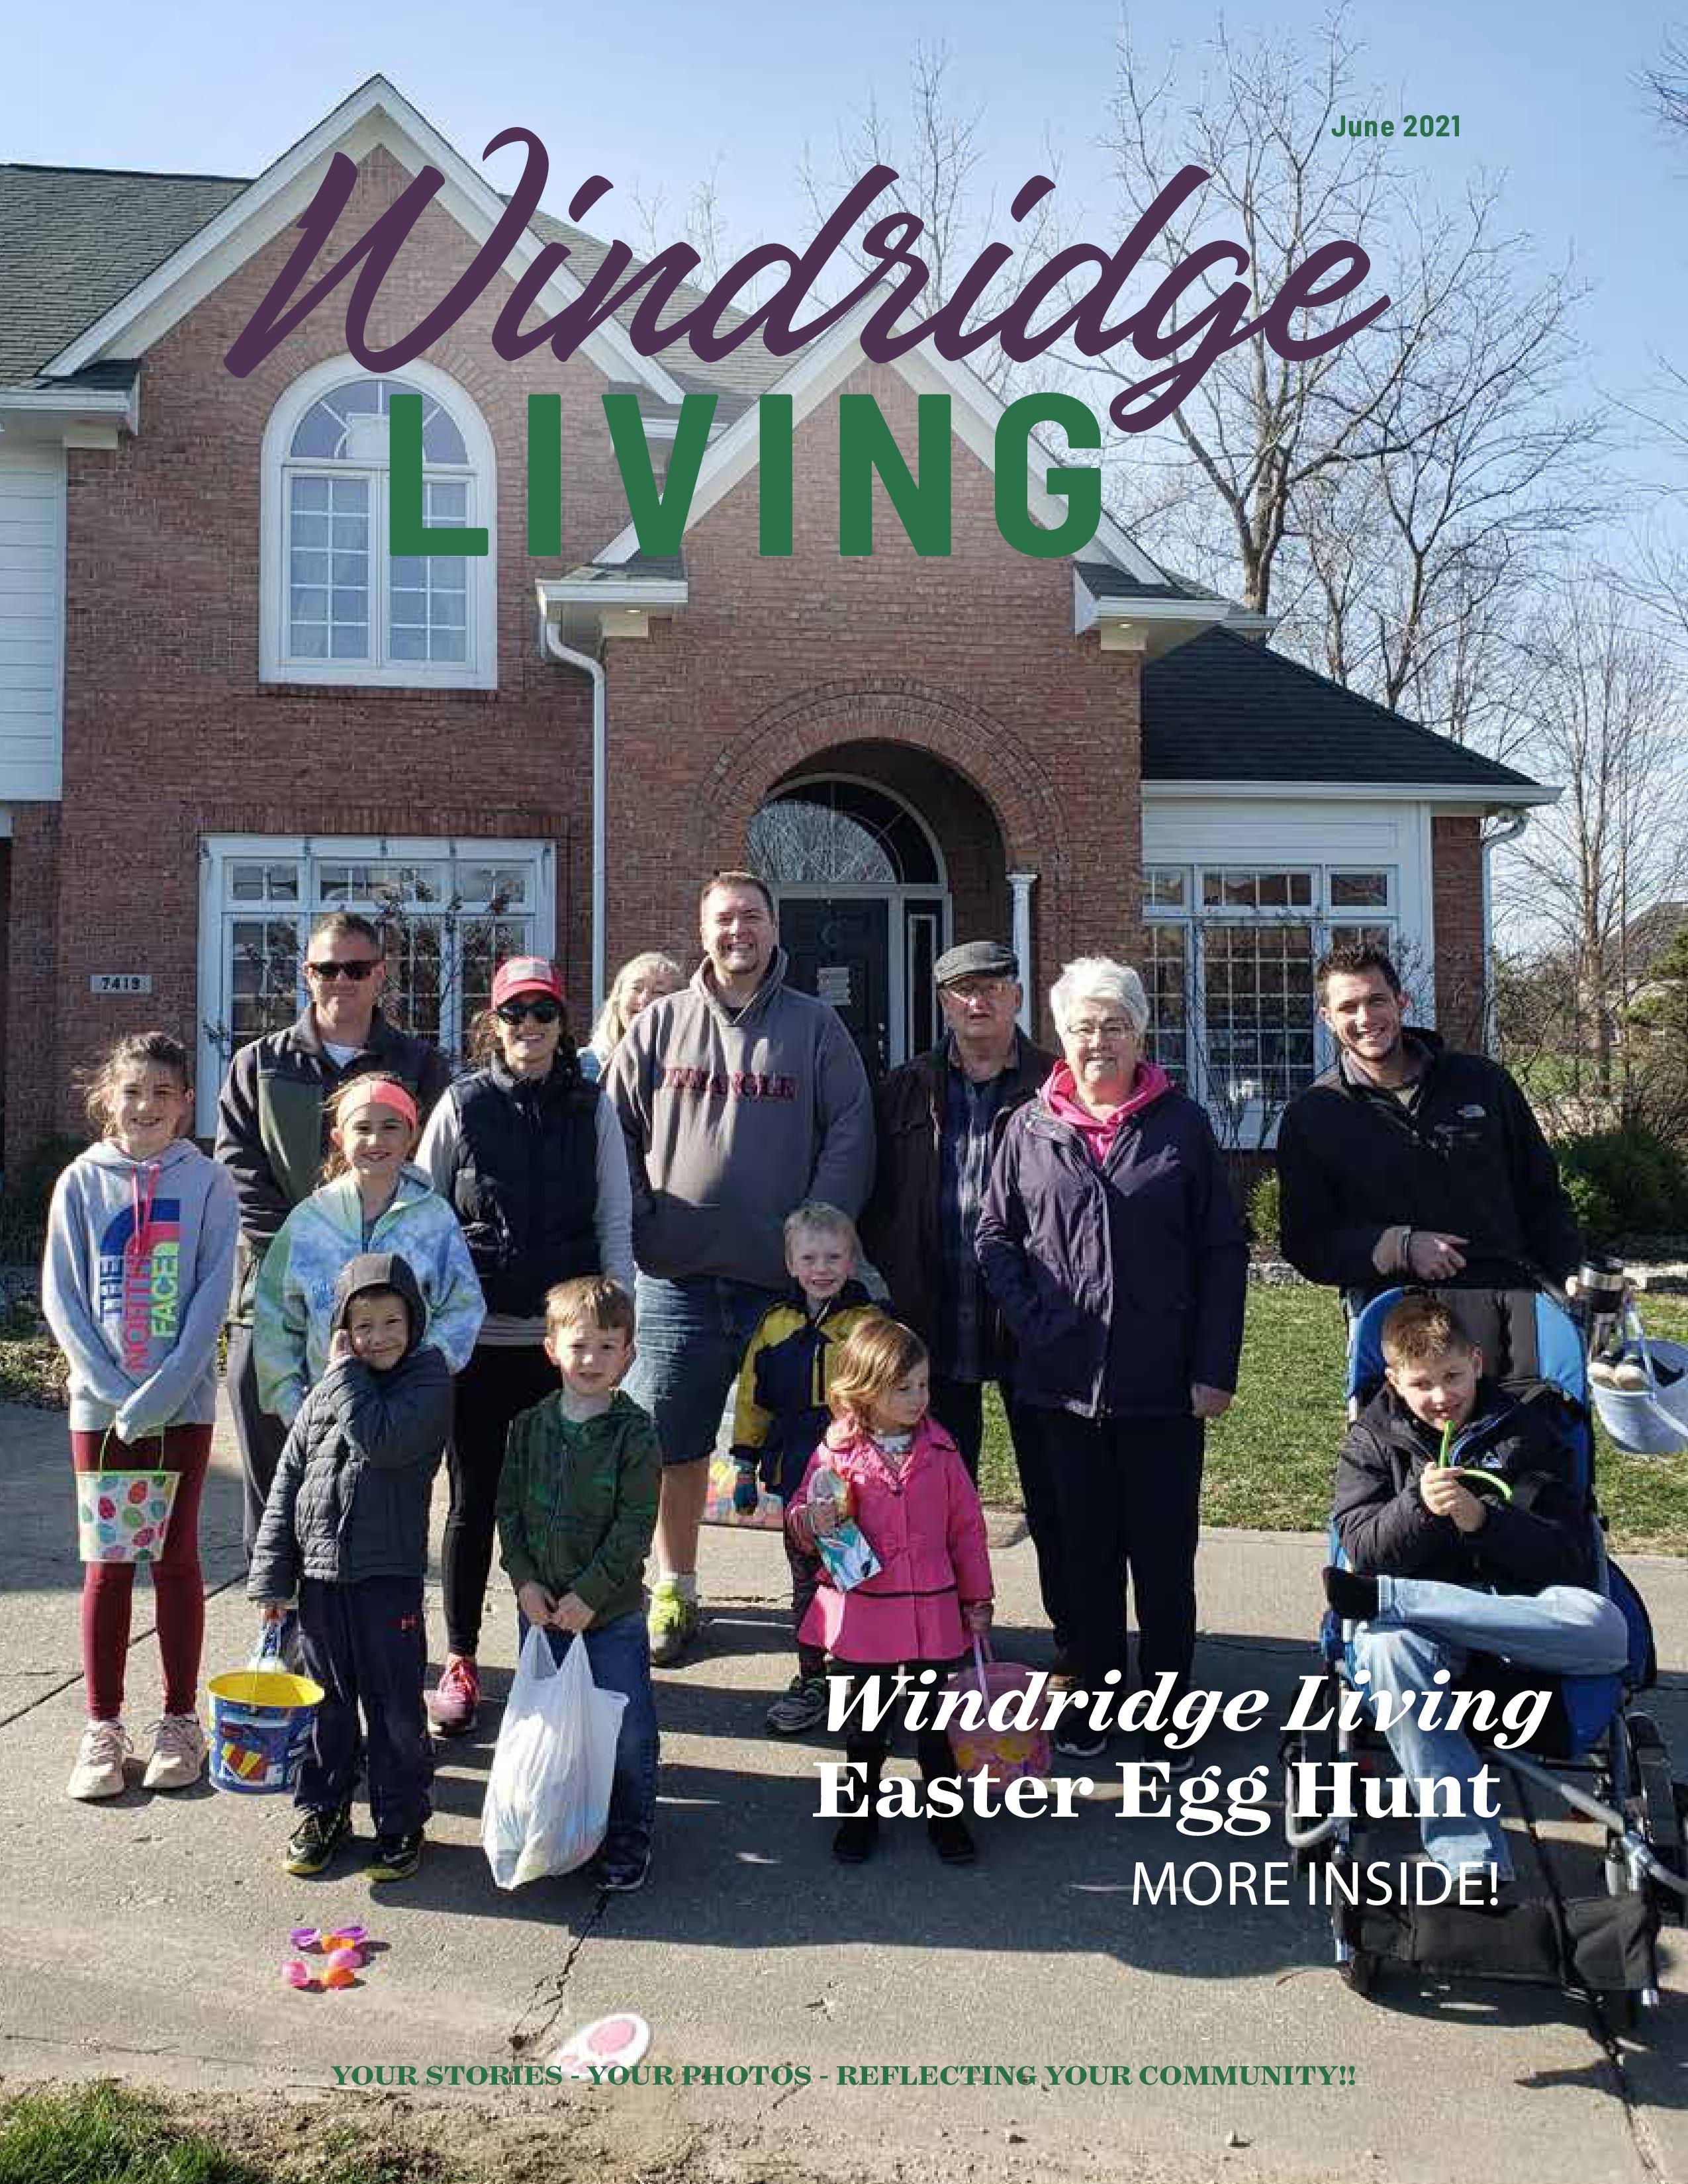 Windridge Living 2021-06-01